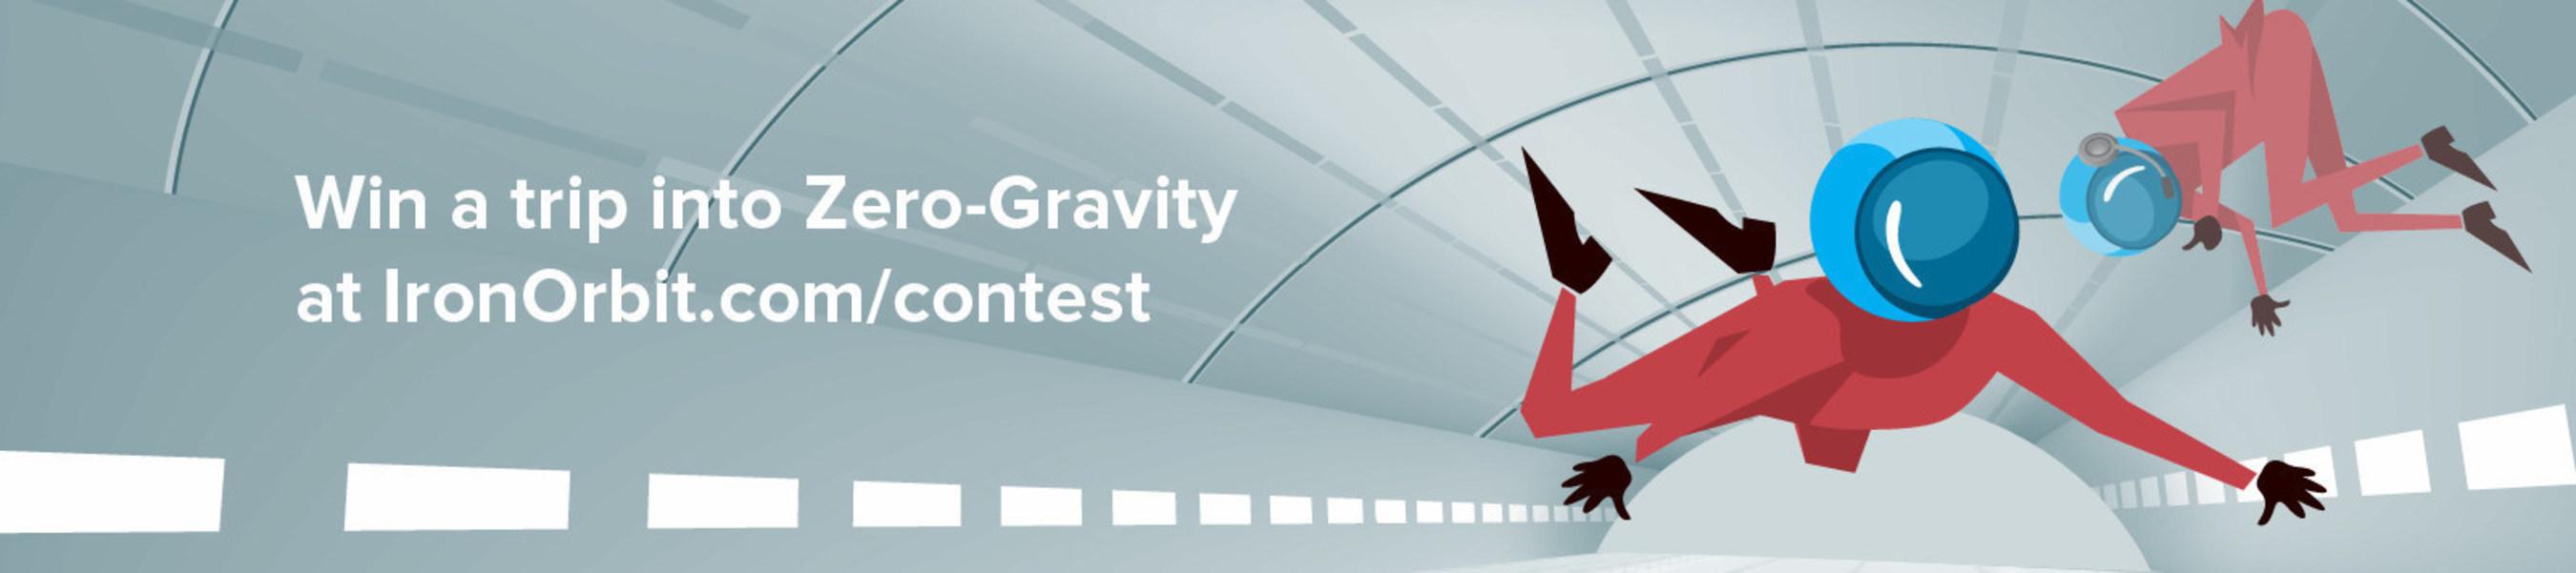 Win a trip into Zero Gravity with Iron Orbit